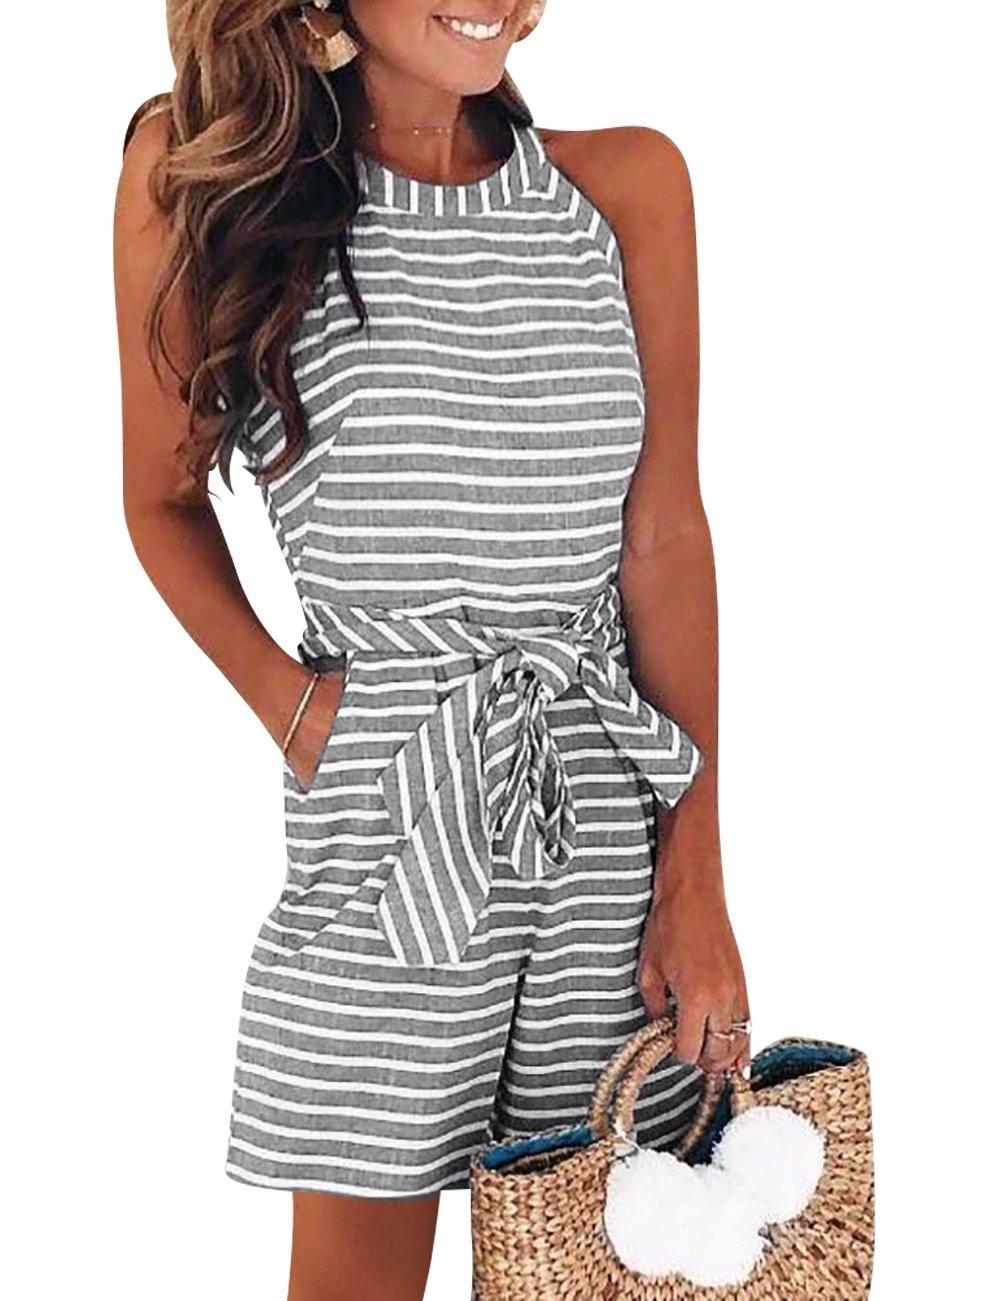 EverChic Women Stripe Romper Sleeveless Zipper Short Jumpsuit Casual Style